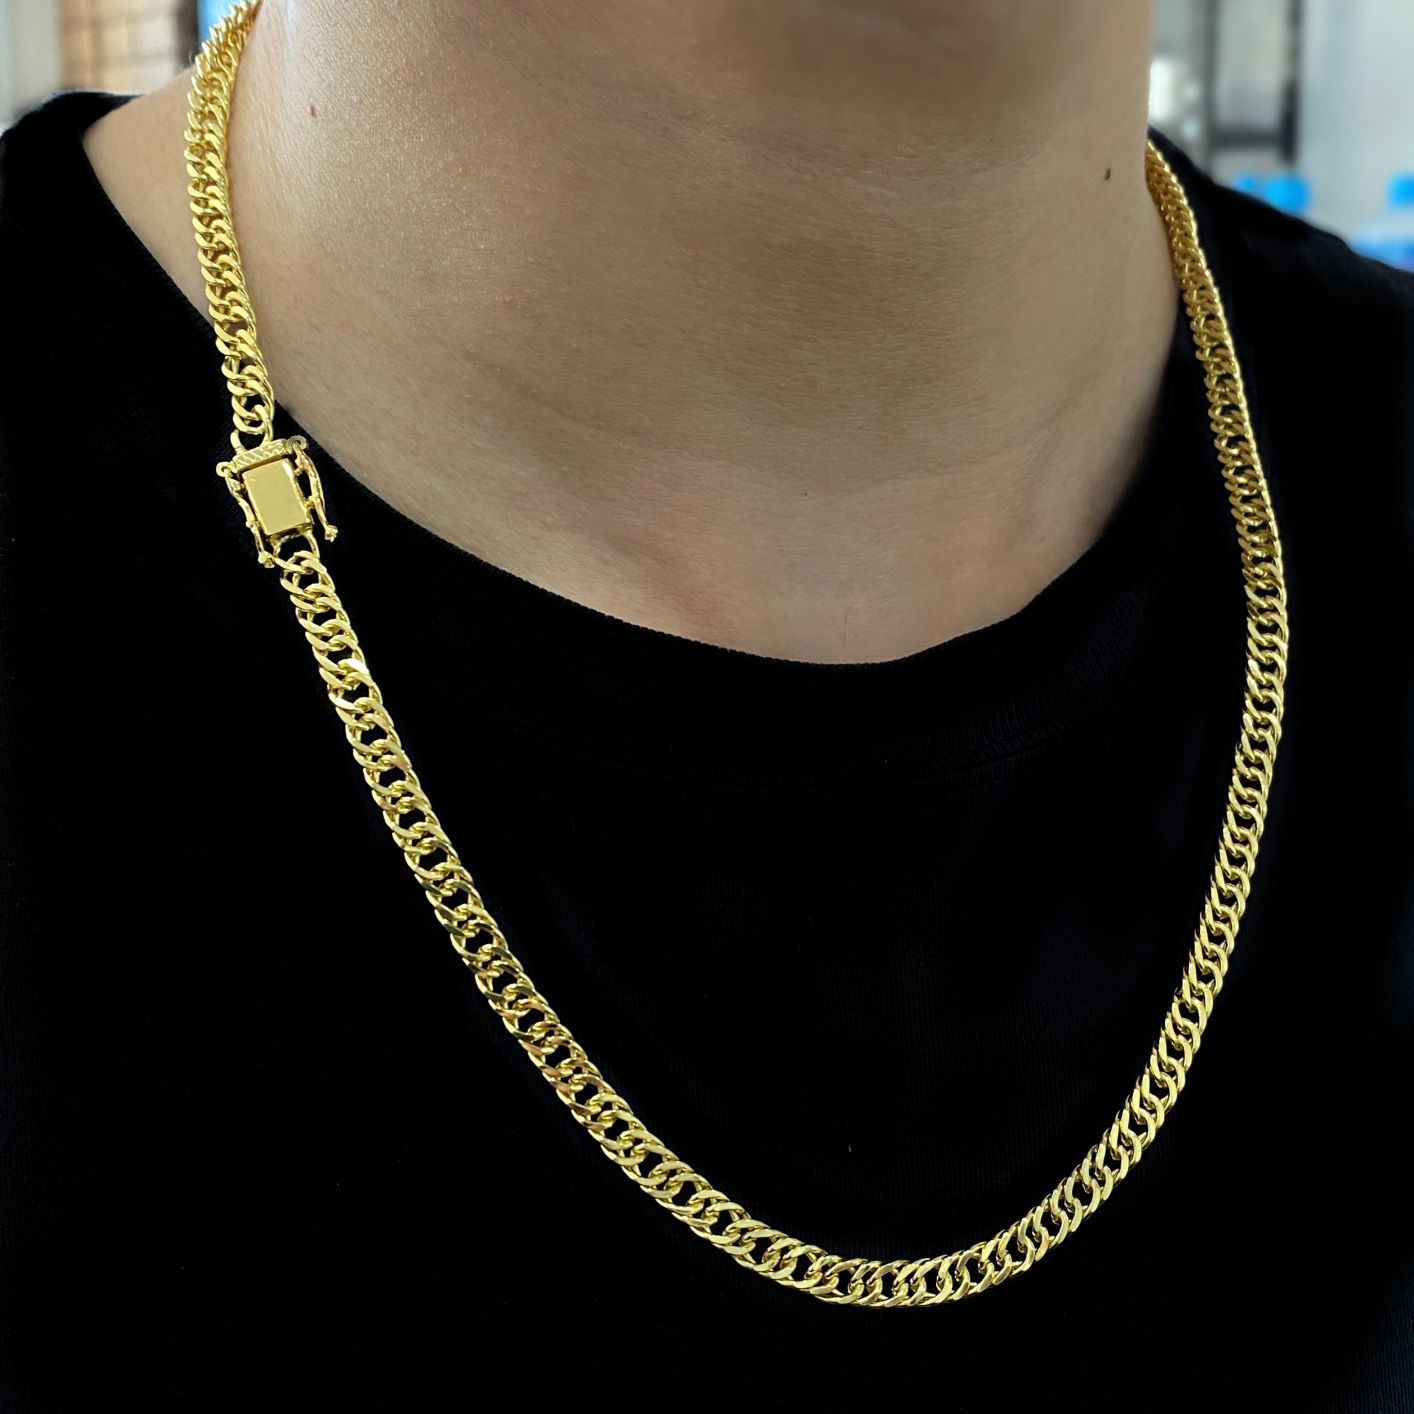 Corrente Double Grumet Diamantada 5,5mm 60cm 28g (Fecho Gaveta Dupla) (Banho Ouro 24K)